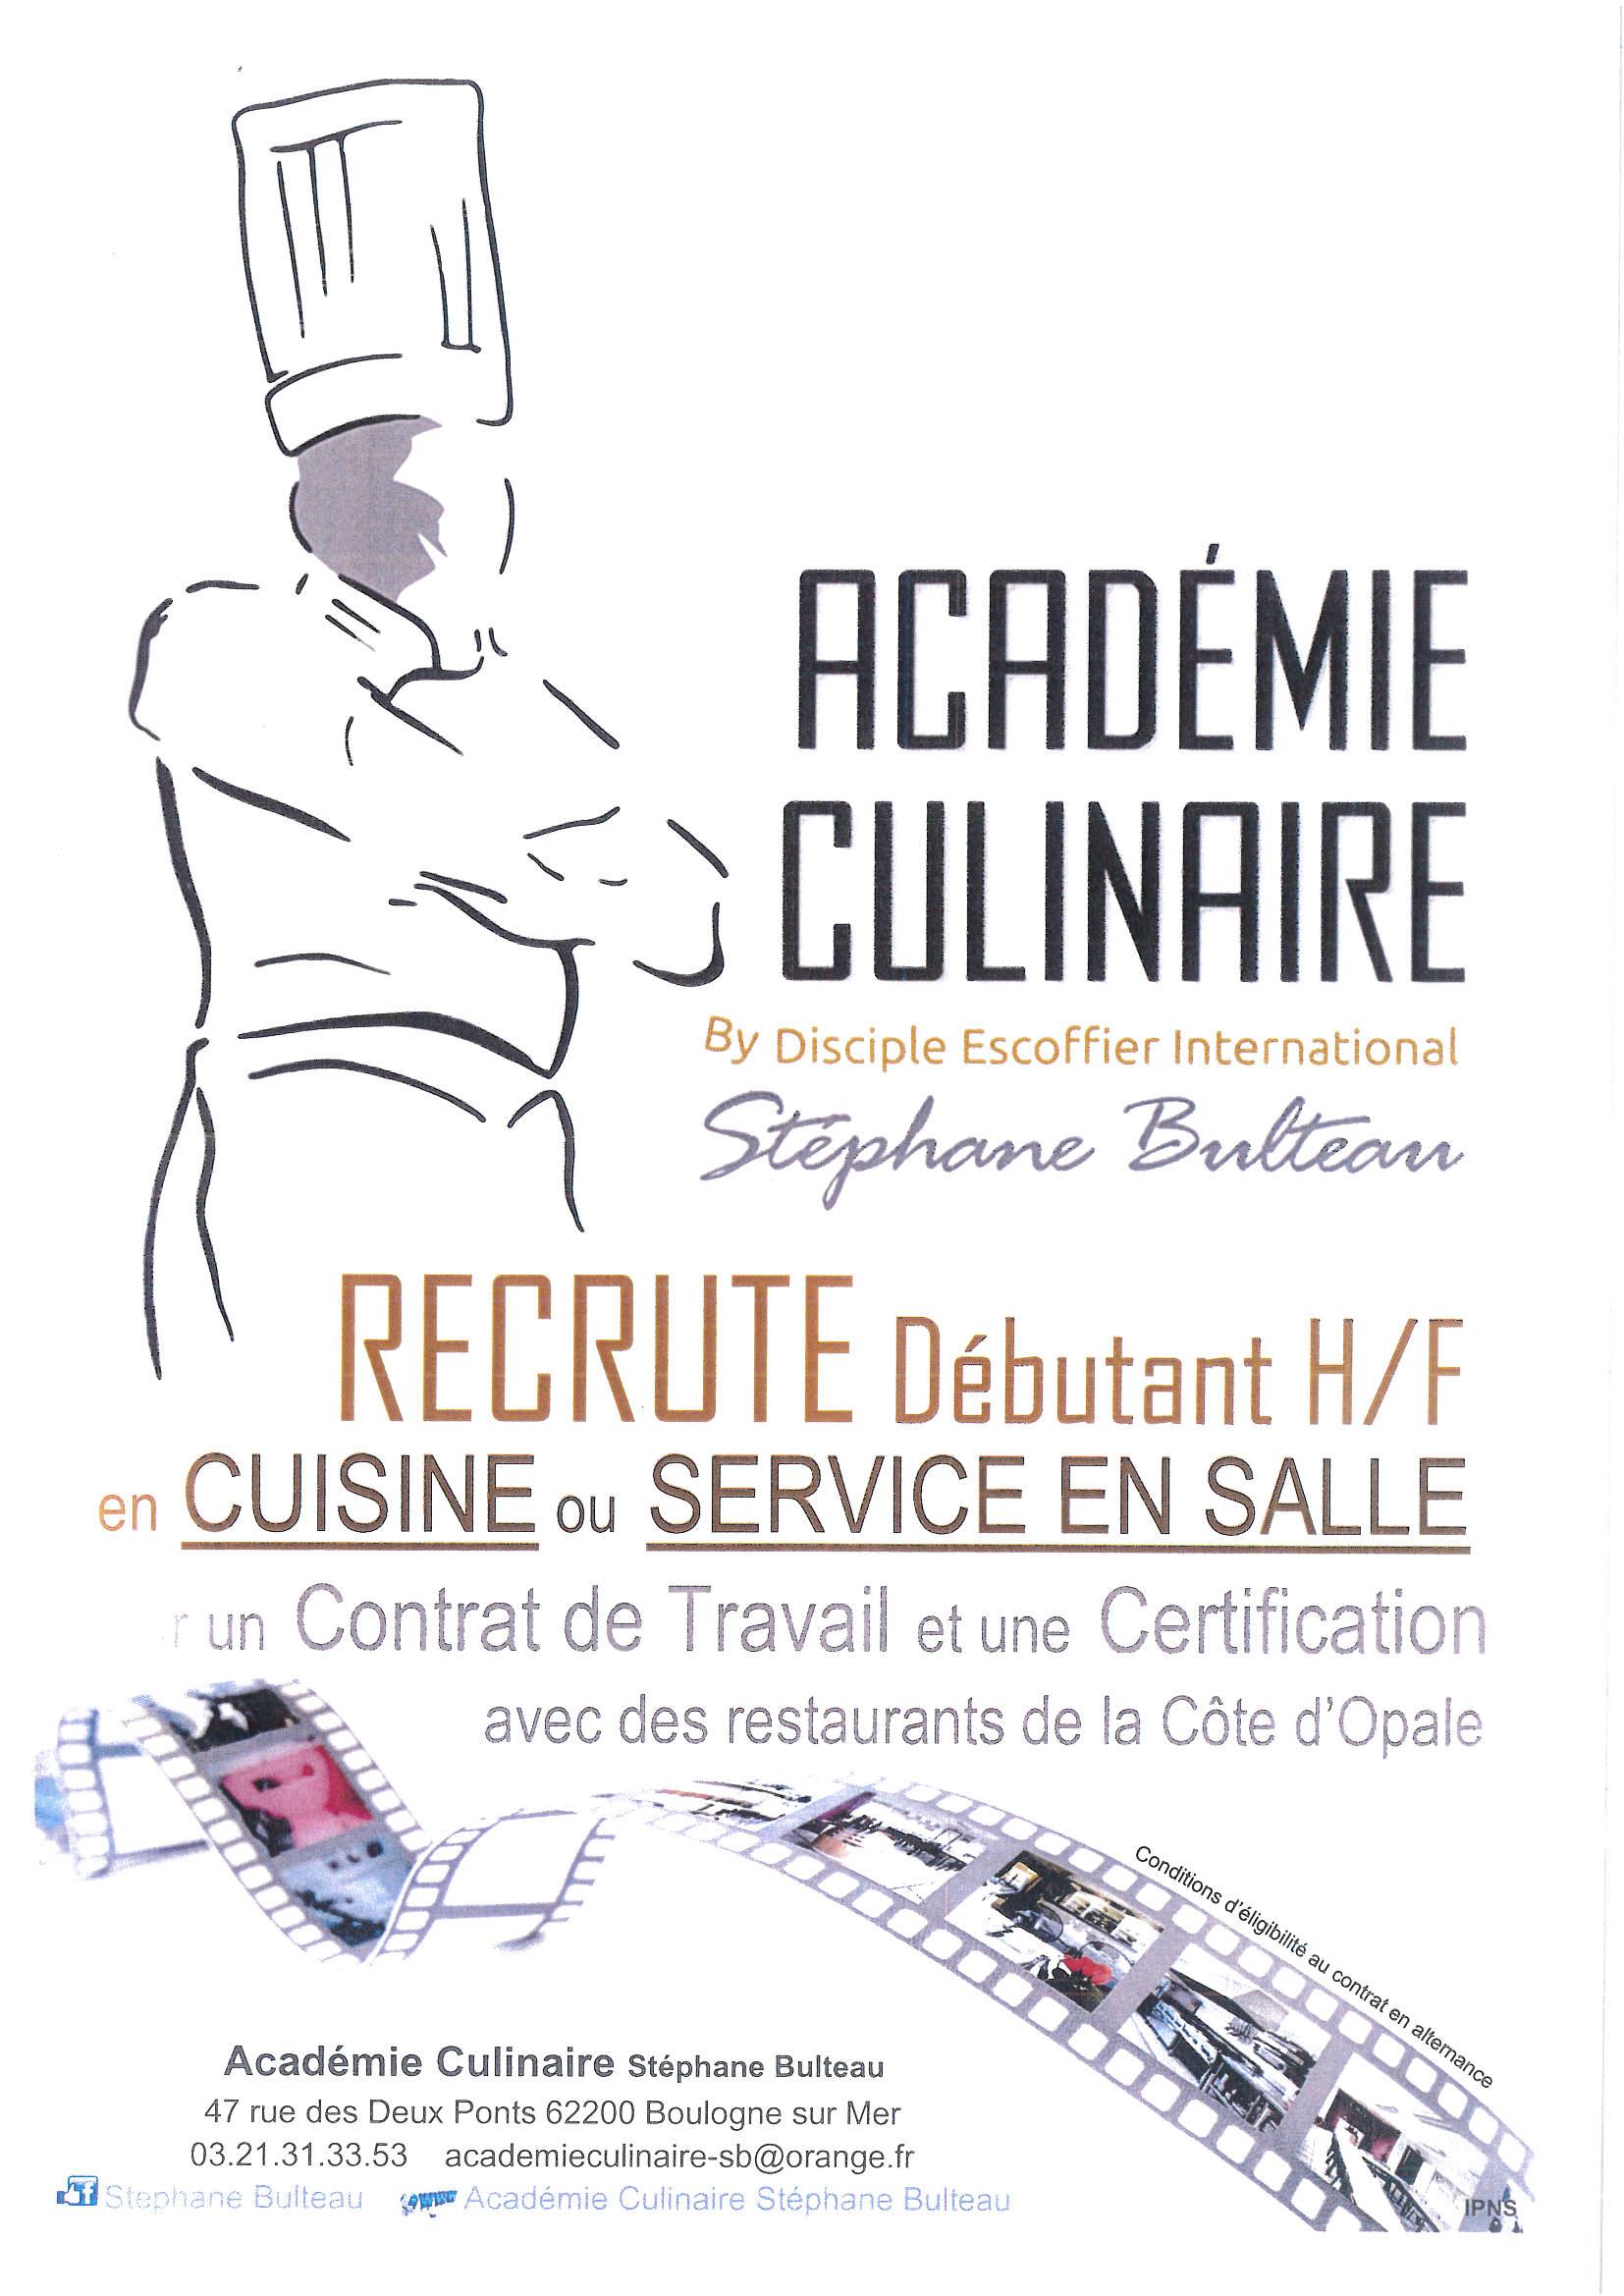 culinaire_001.jpg